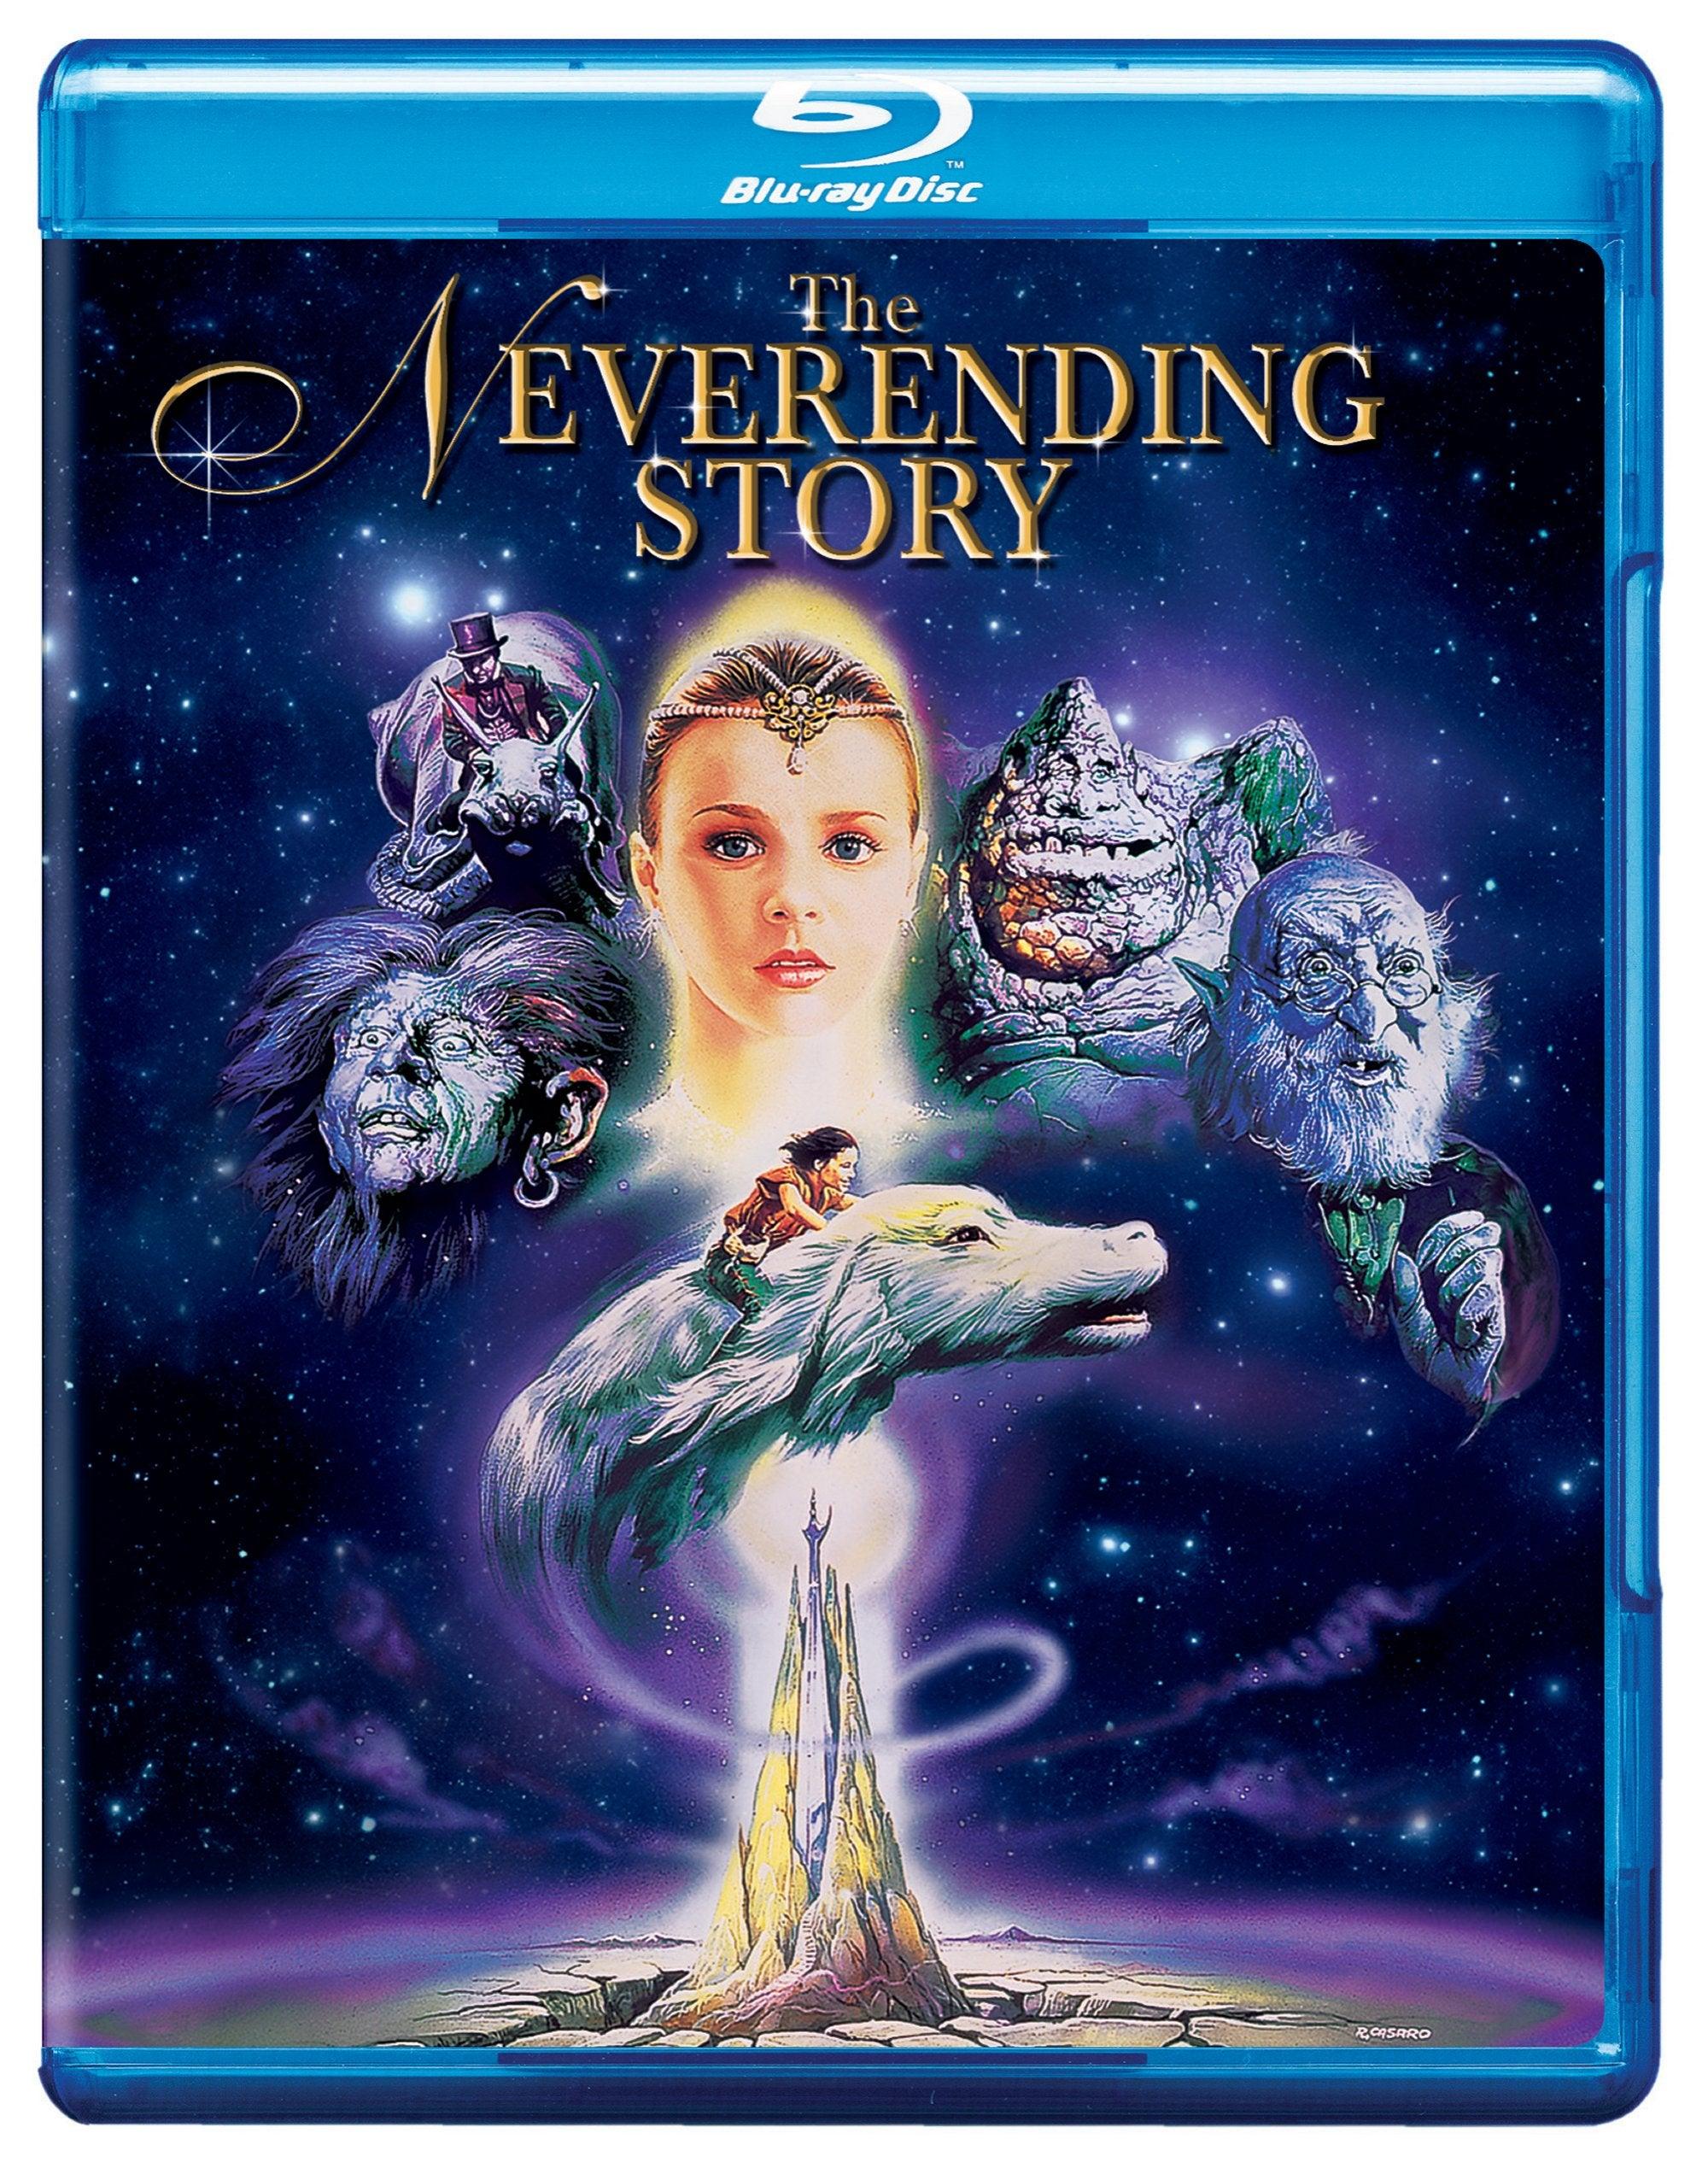 Neverending Story (Blu-ray Disc)